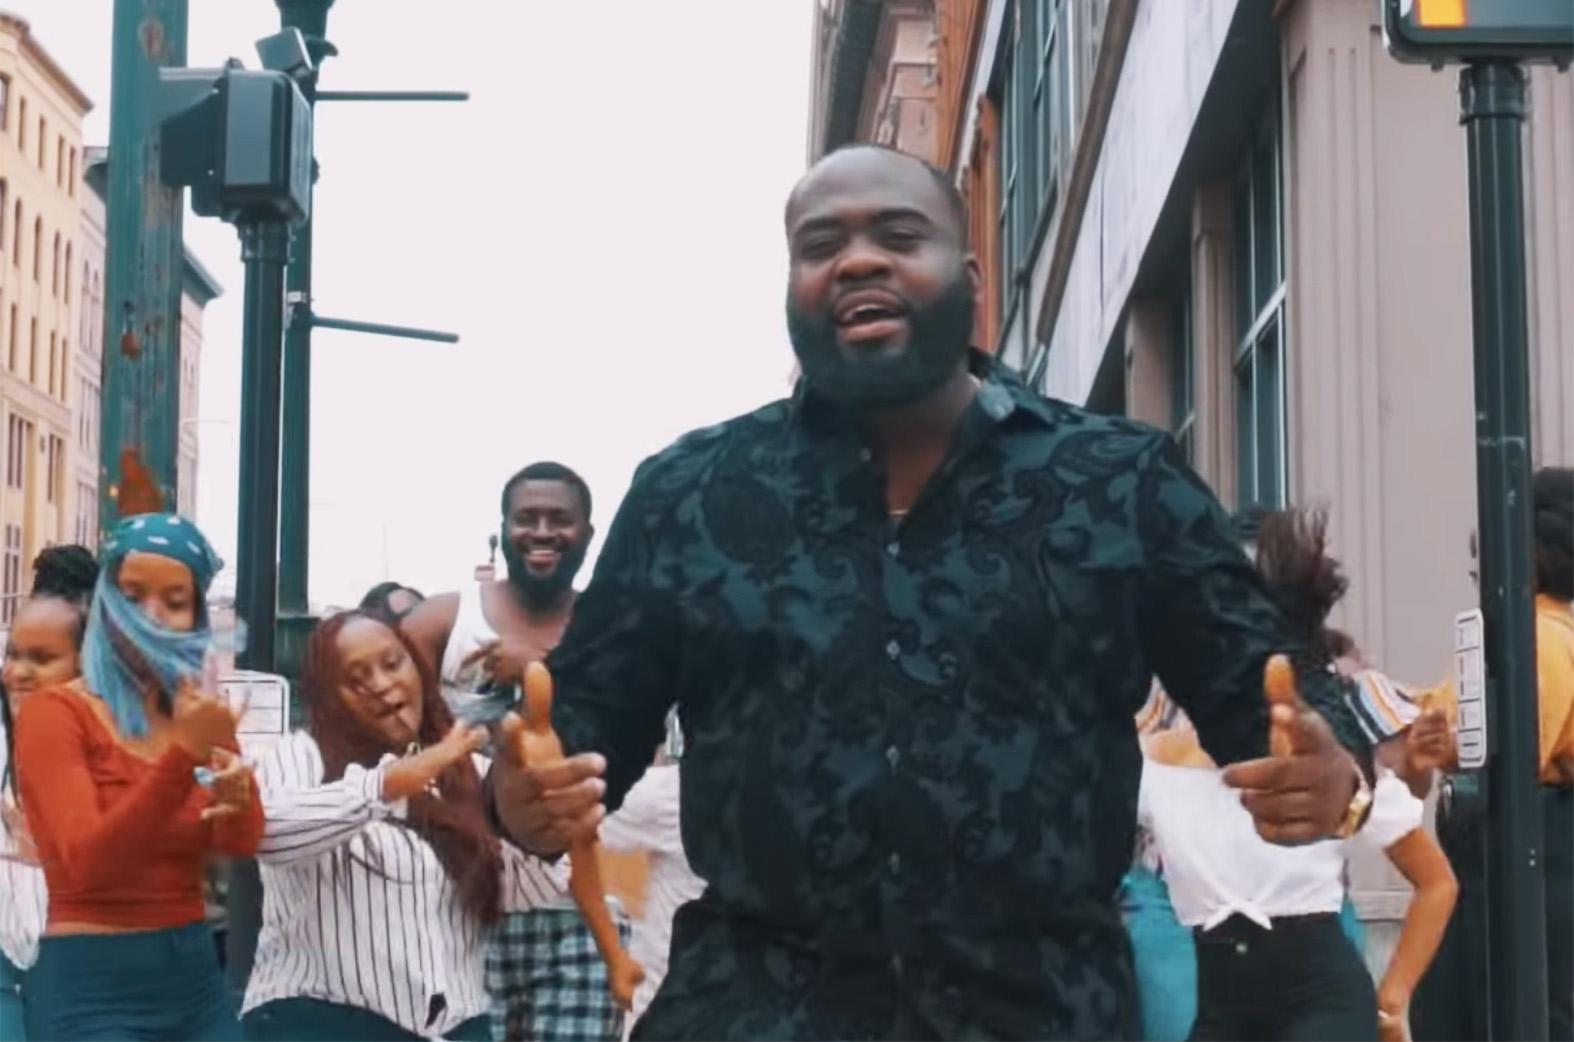 Video: We Praise U by Nana Abayie